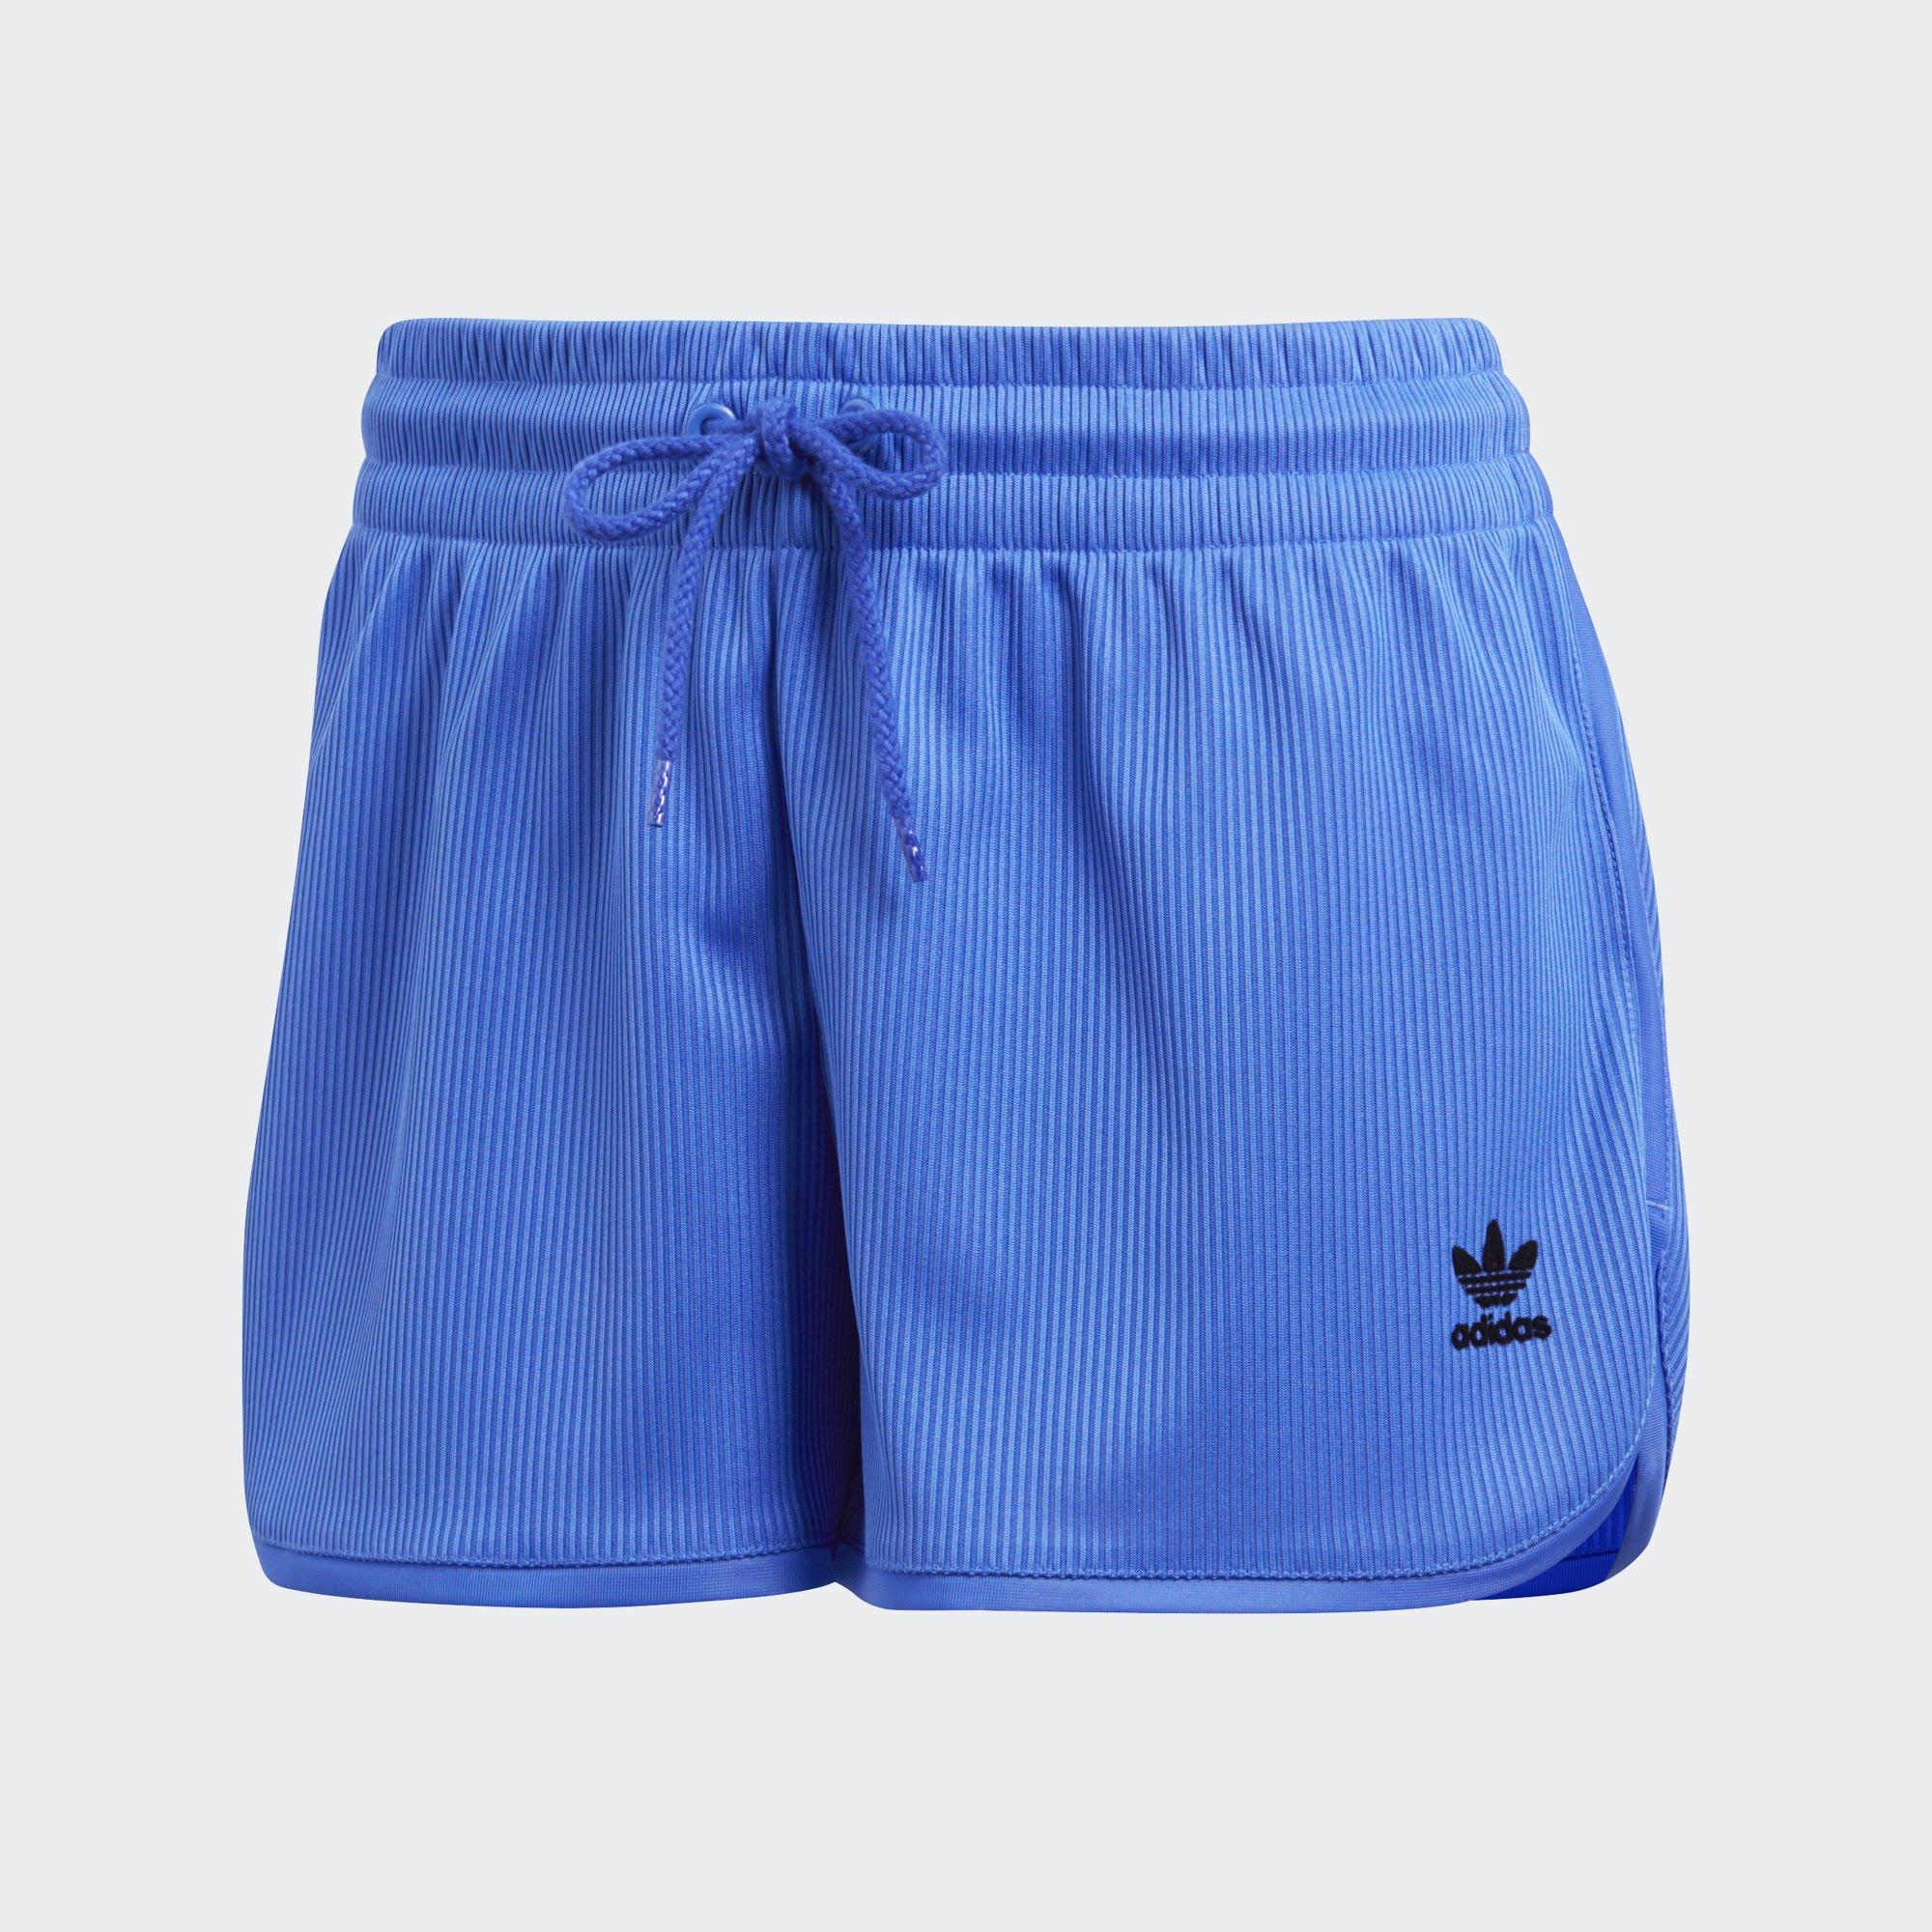 JMX adidas Fashion League Rib Shorts CE3712 運動 休閒短褲